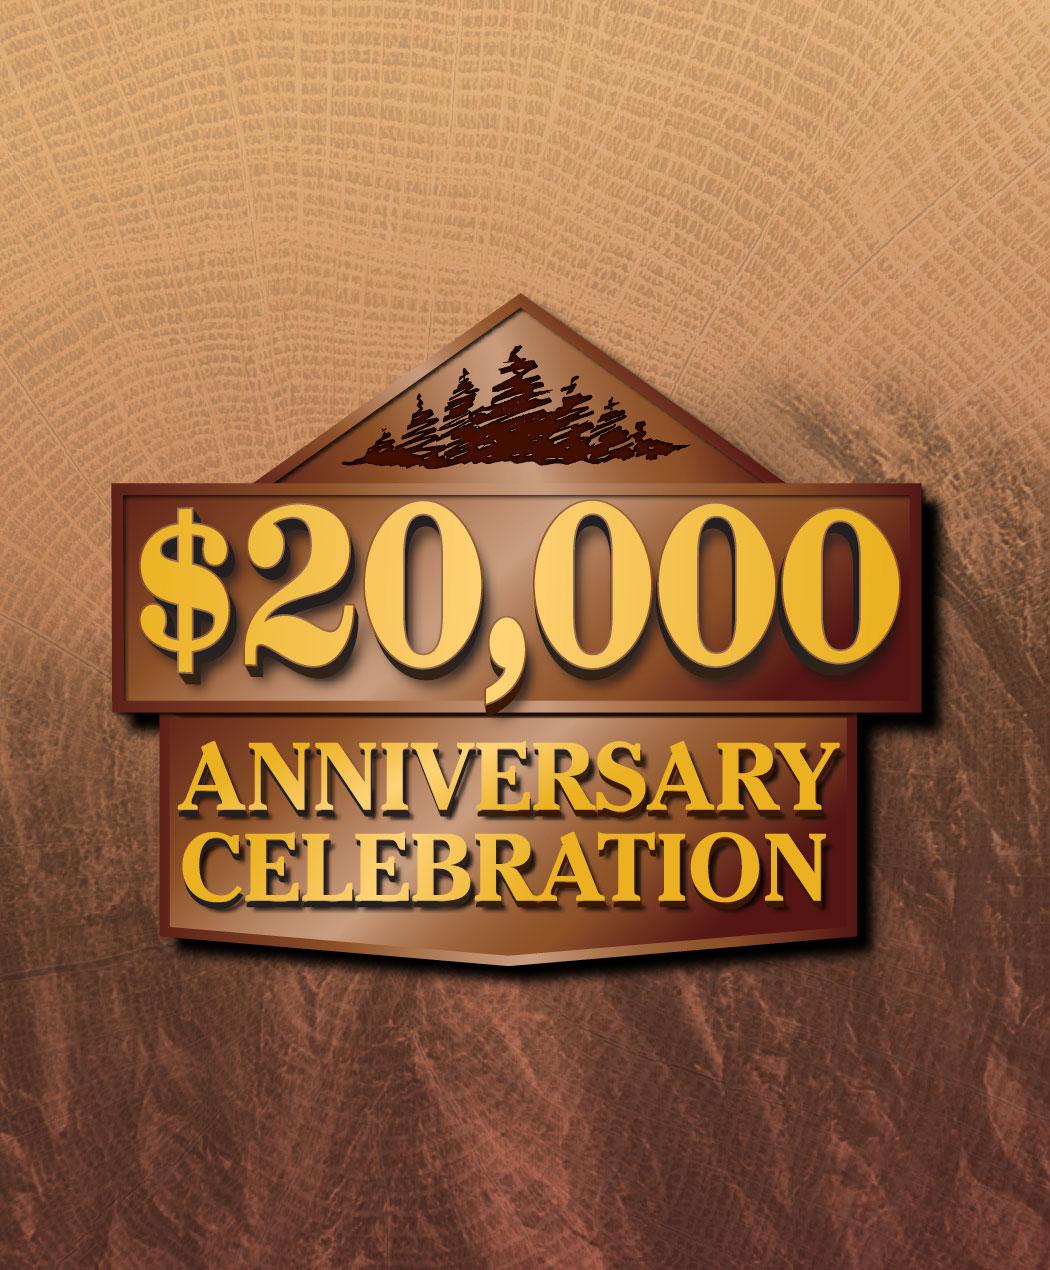 $20,000 Anniversary Celebration